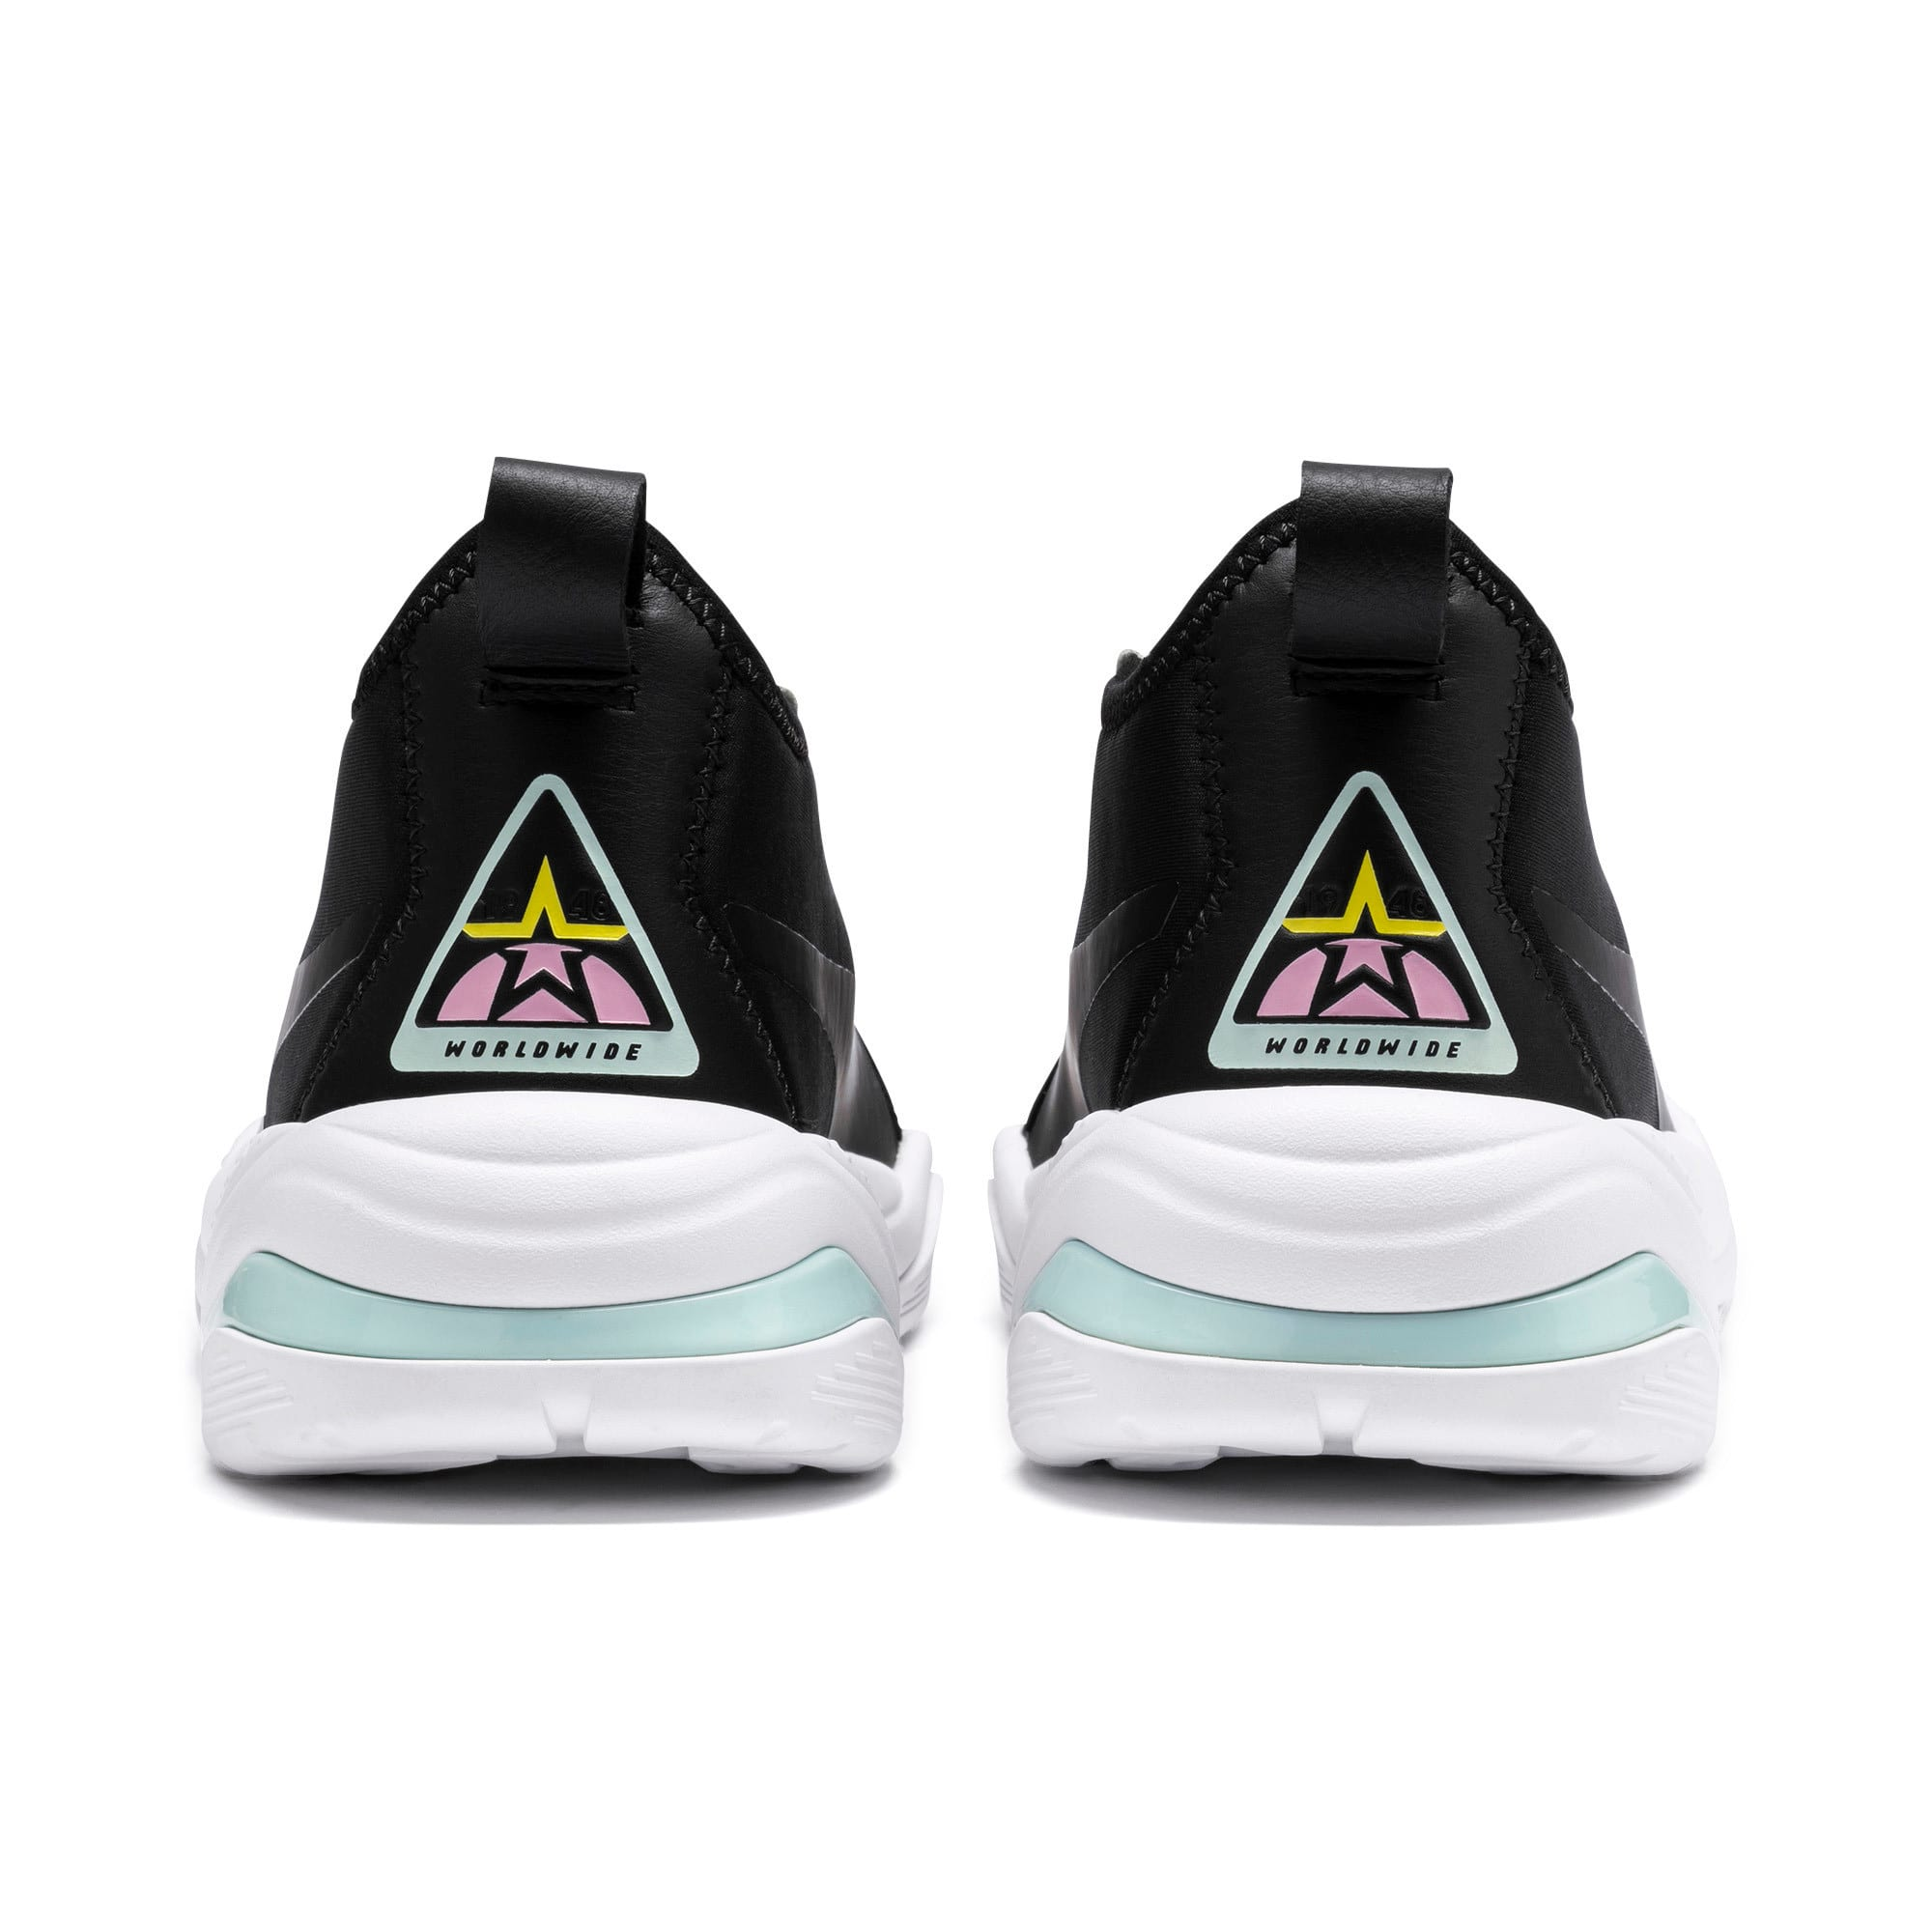 Miniatura 4 de Zapatos deportivos para mujer Thunder Trailblazer, Puma Black-Pale Pink, mediano